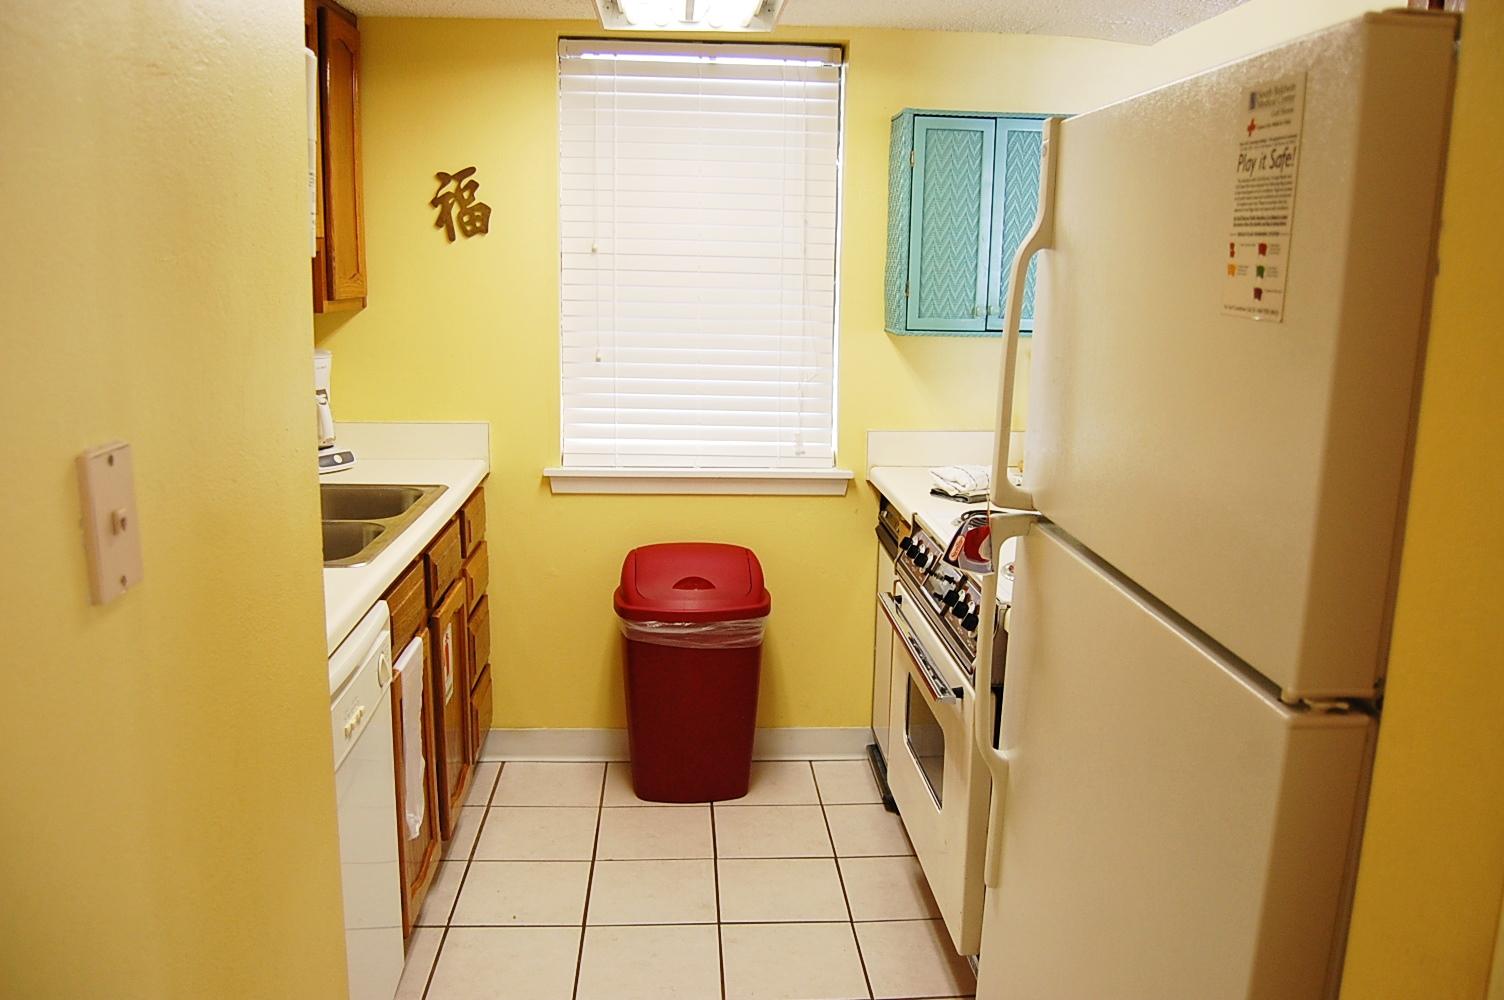 Gulf House 606 Condo rental in Gulf House Condominiums in Gulf Shores Alabama - #8